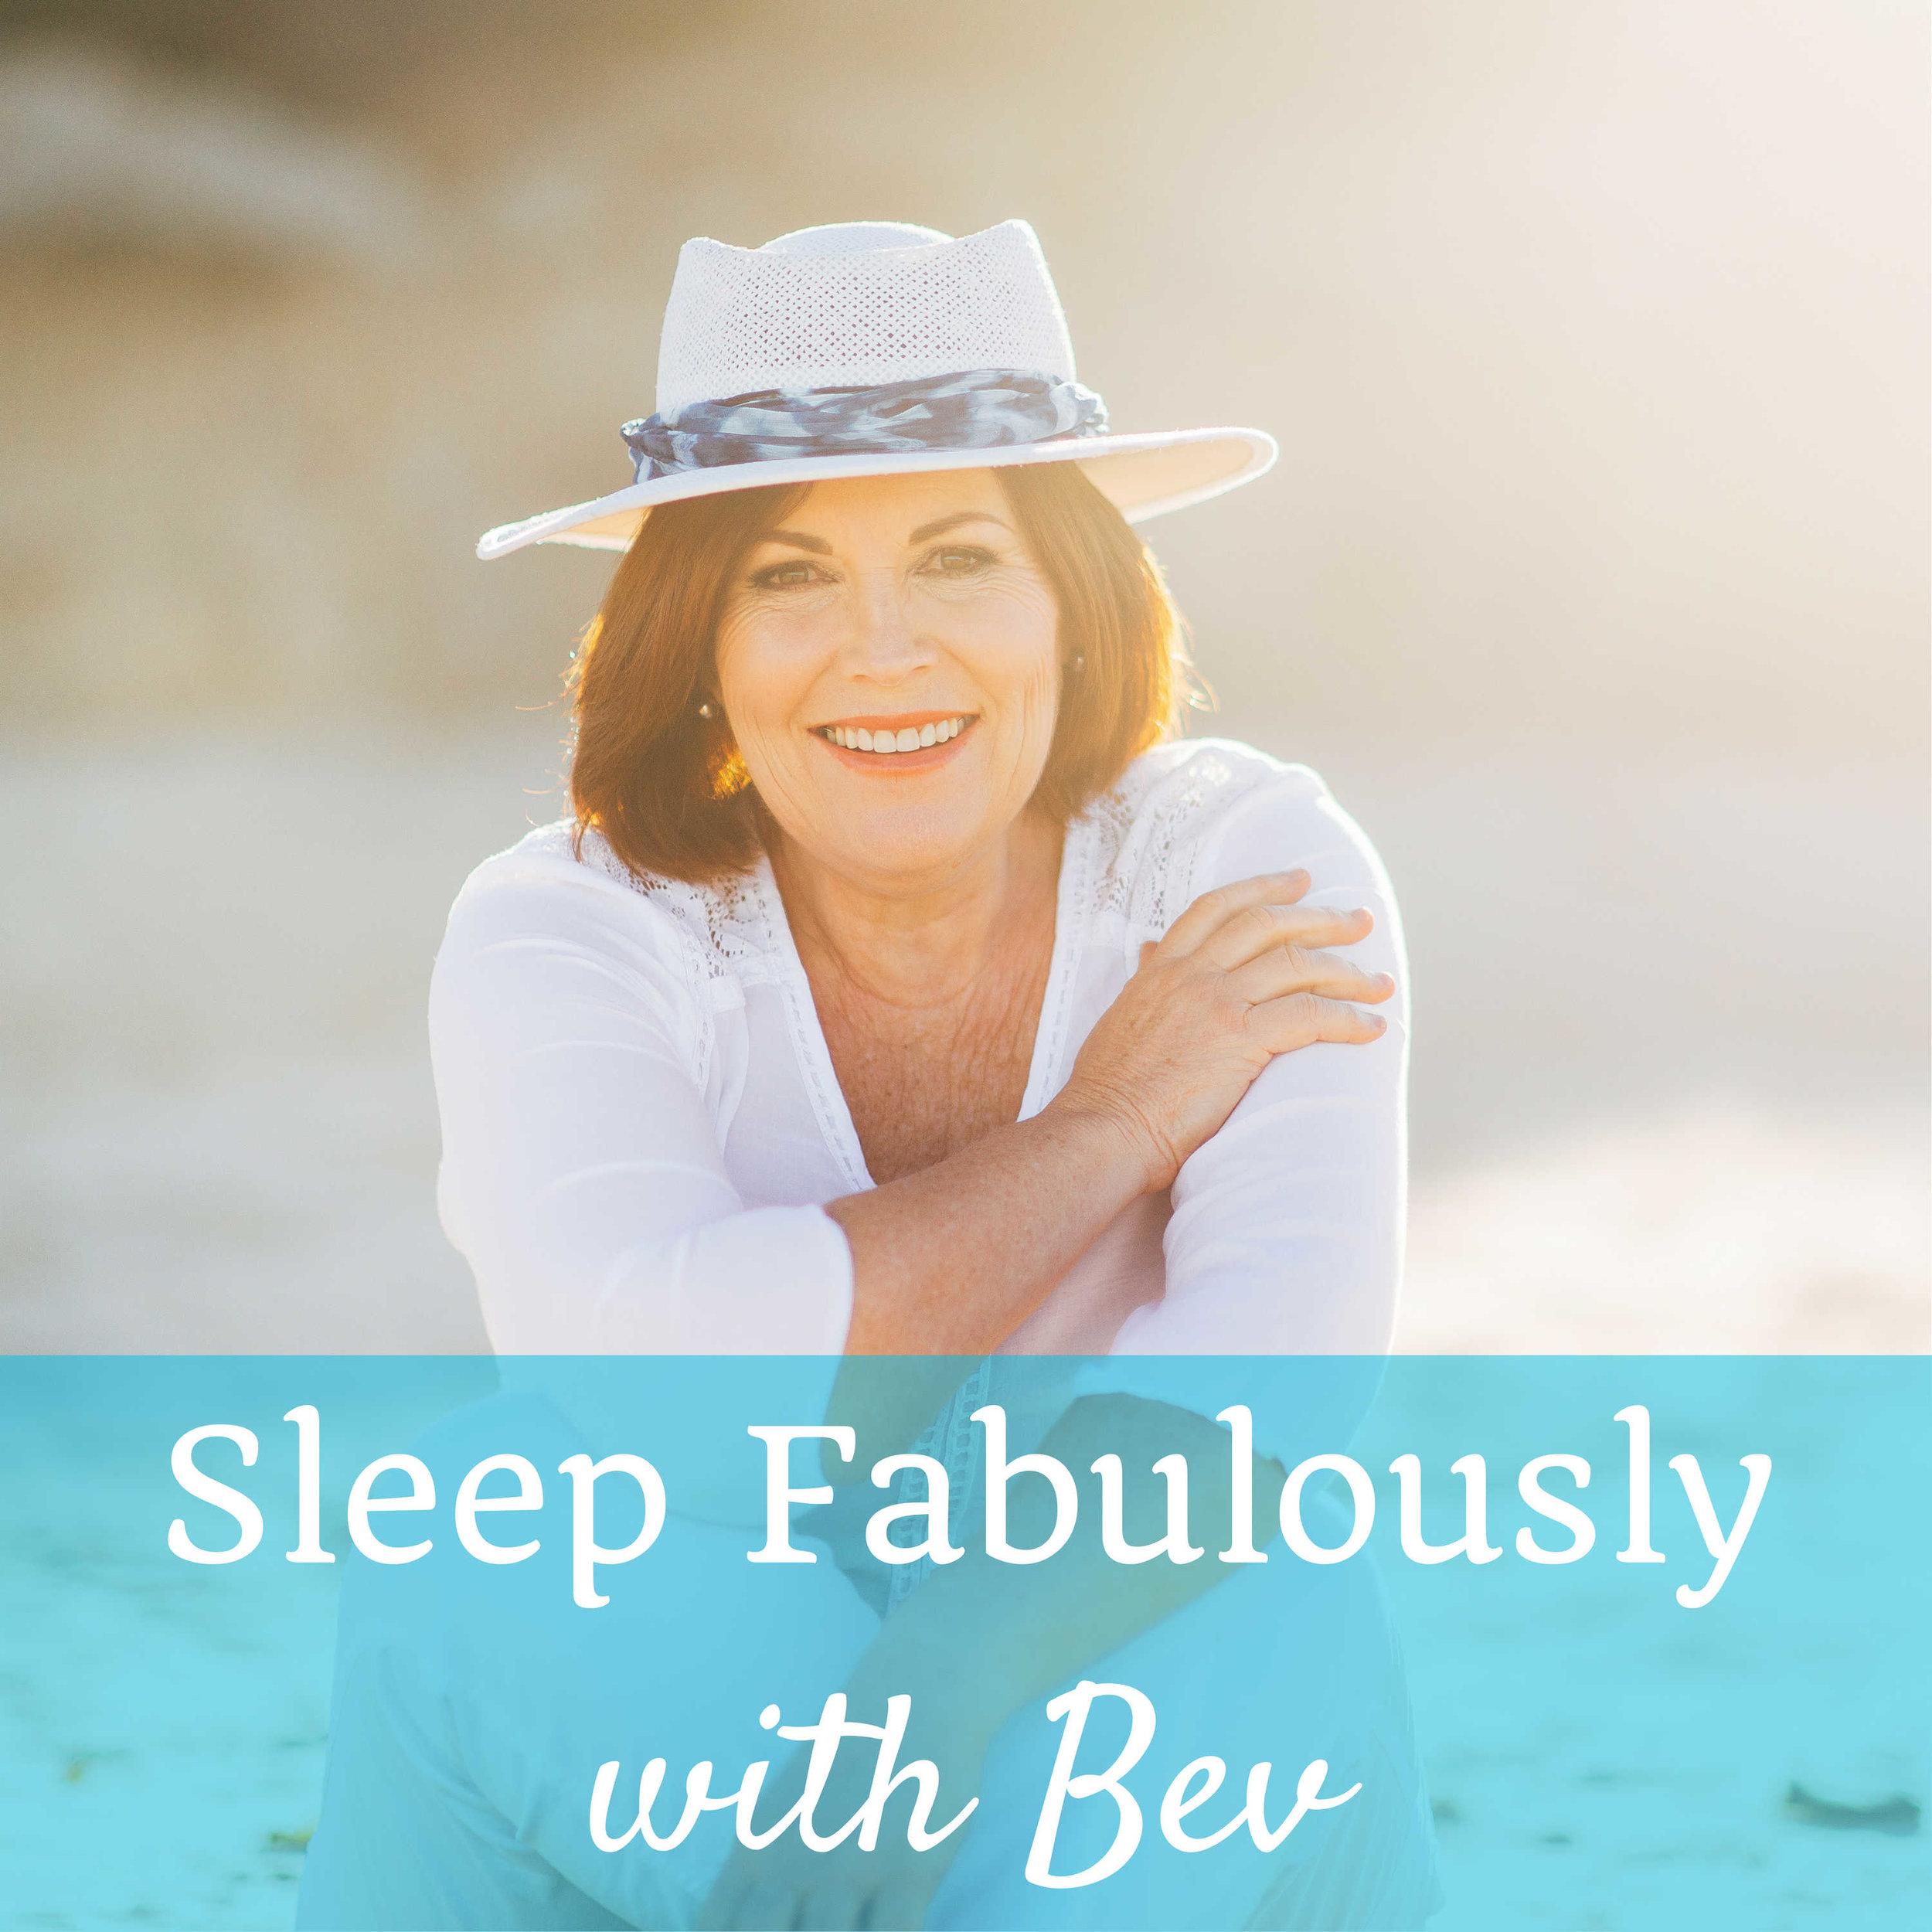 Sleep Fabulously the program that transforms your sleep